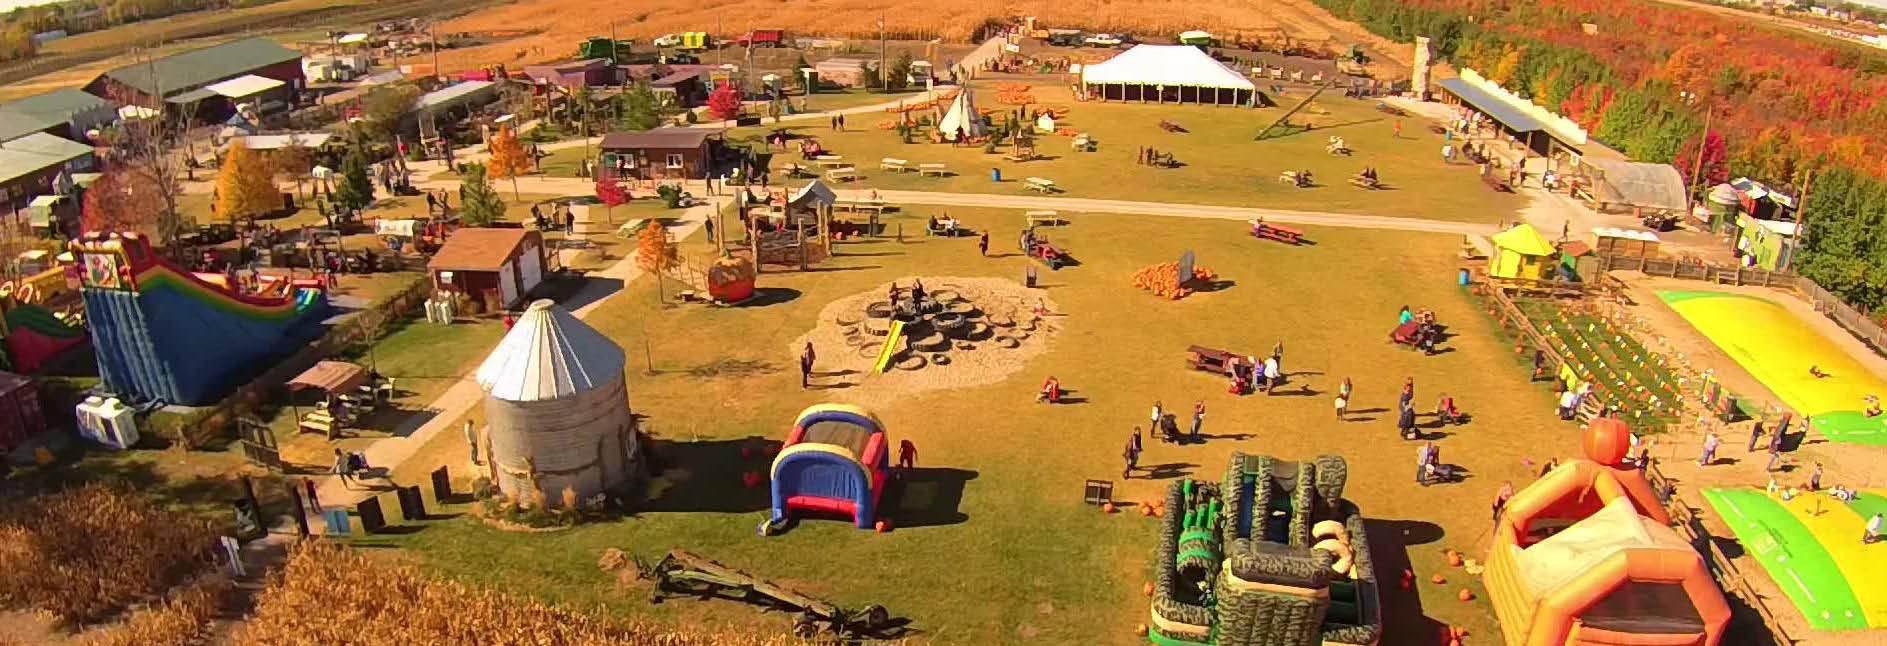 Aerial view of Siegel's Cottonwood Farm